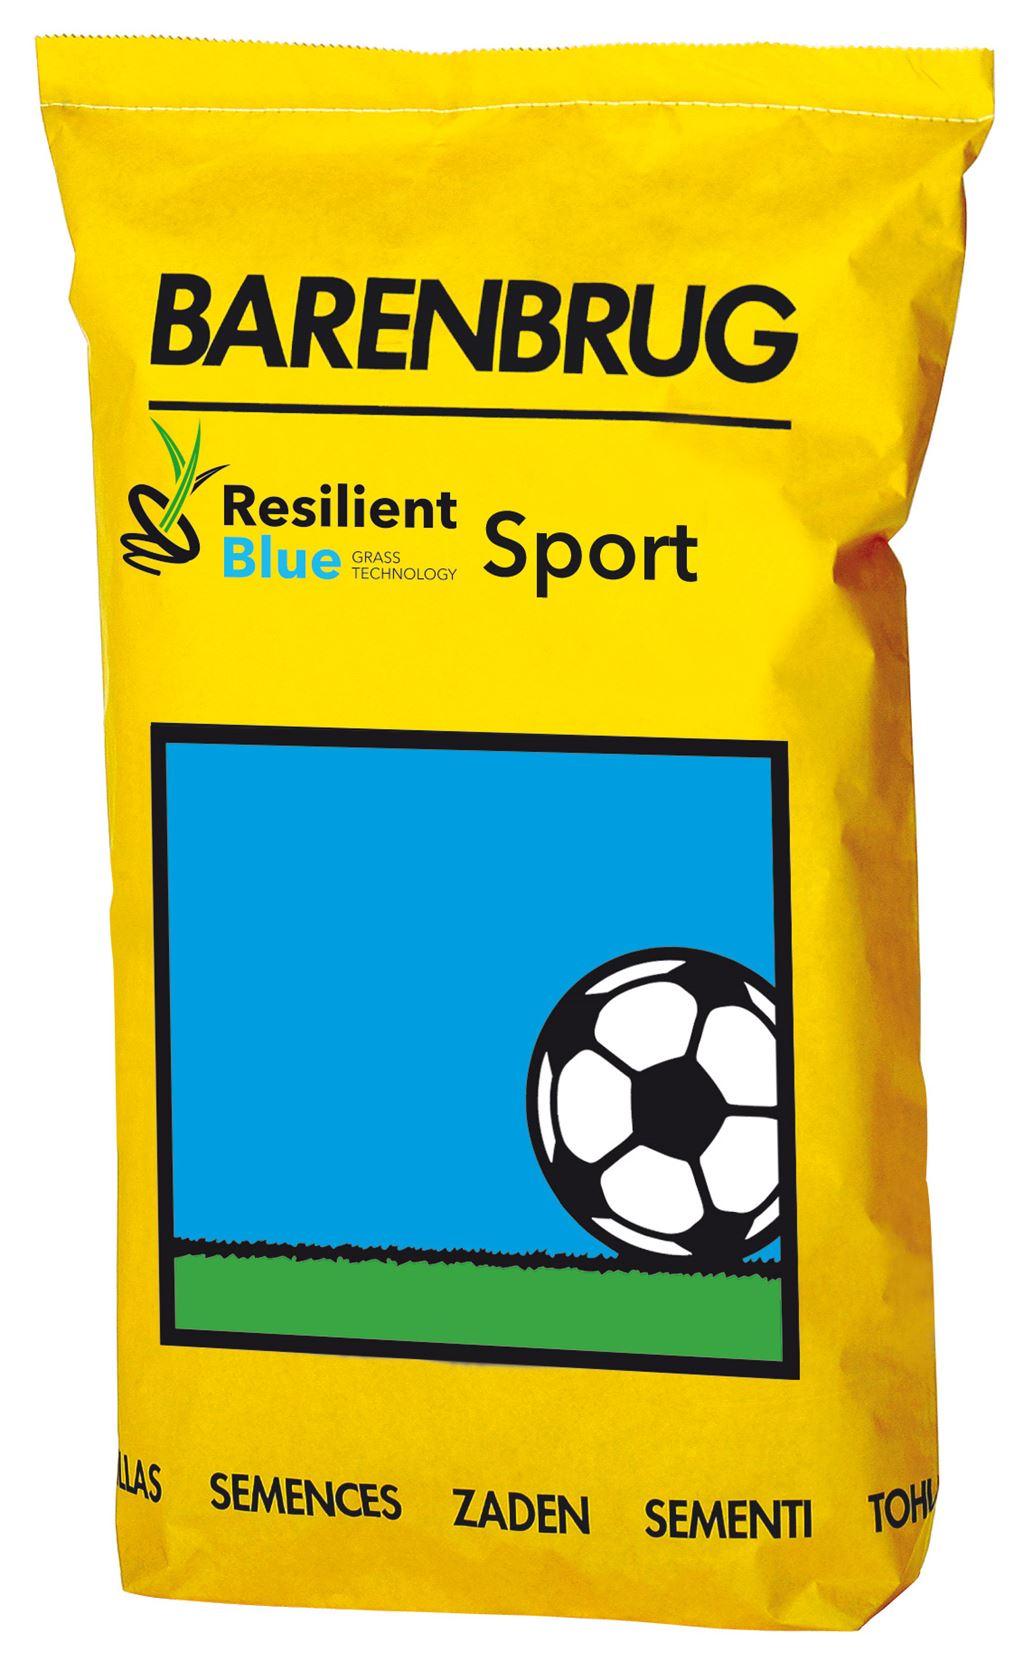 Resilient-Blue-Sport-15kg-Extreem-sterk-sportgras-tegen-droogte-en-zelfherstellend-met-YJWM